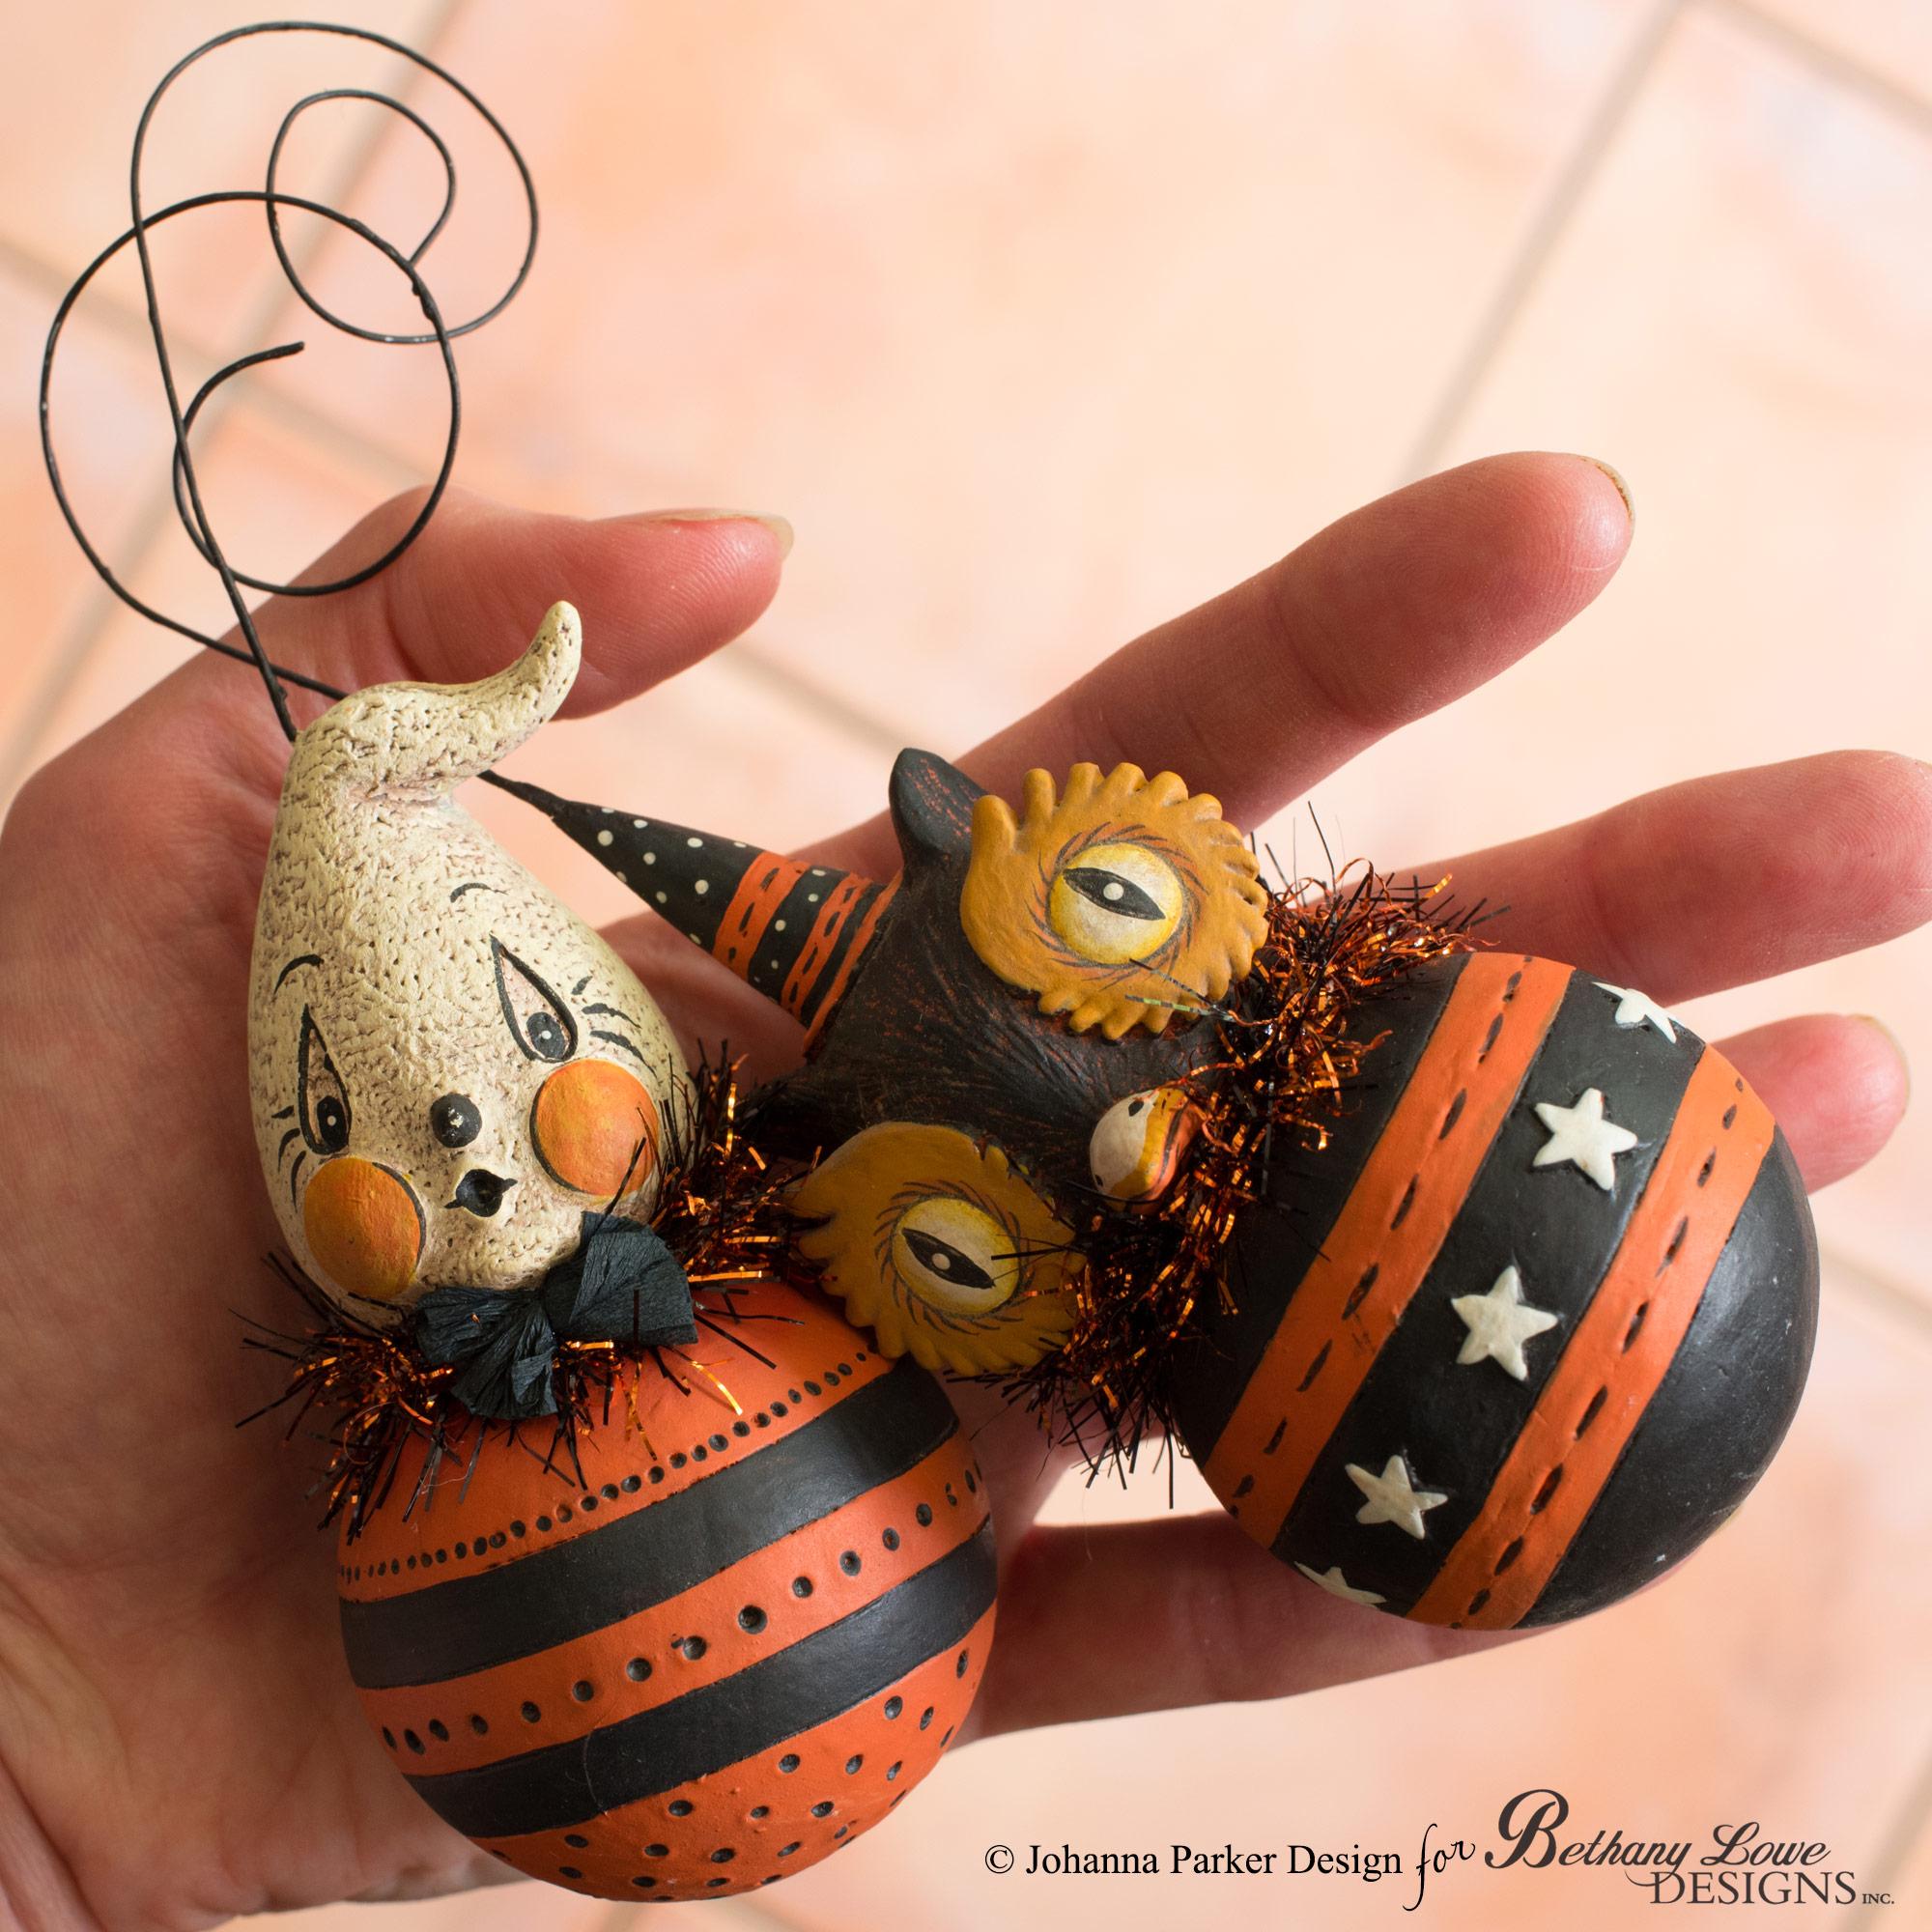 Halloween-BLD-Ball-Ornaments-in-Hand.jpg